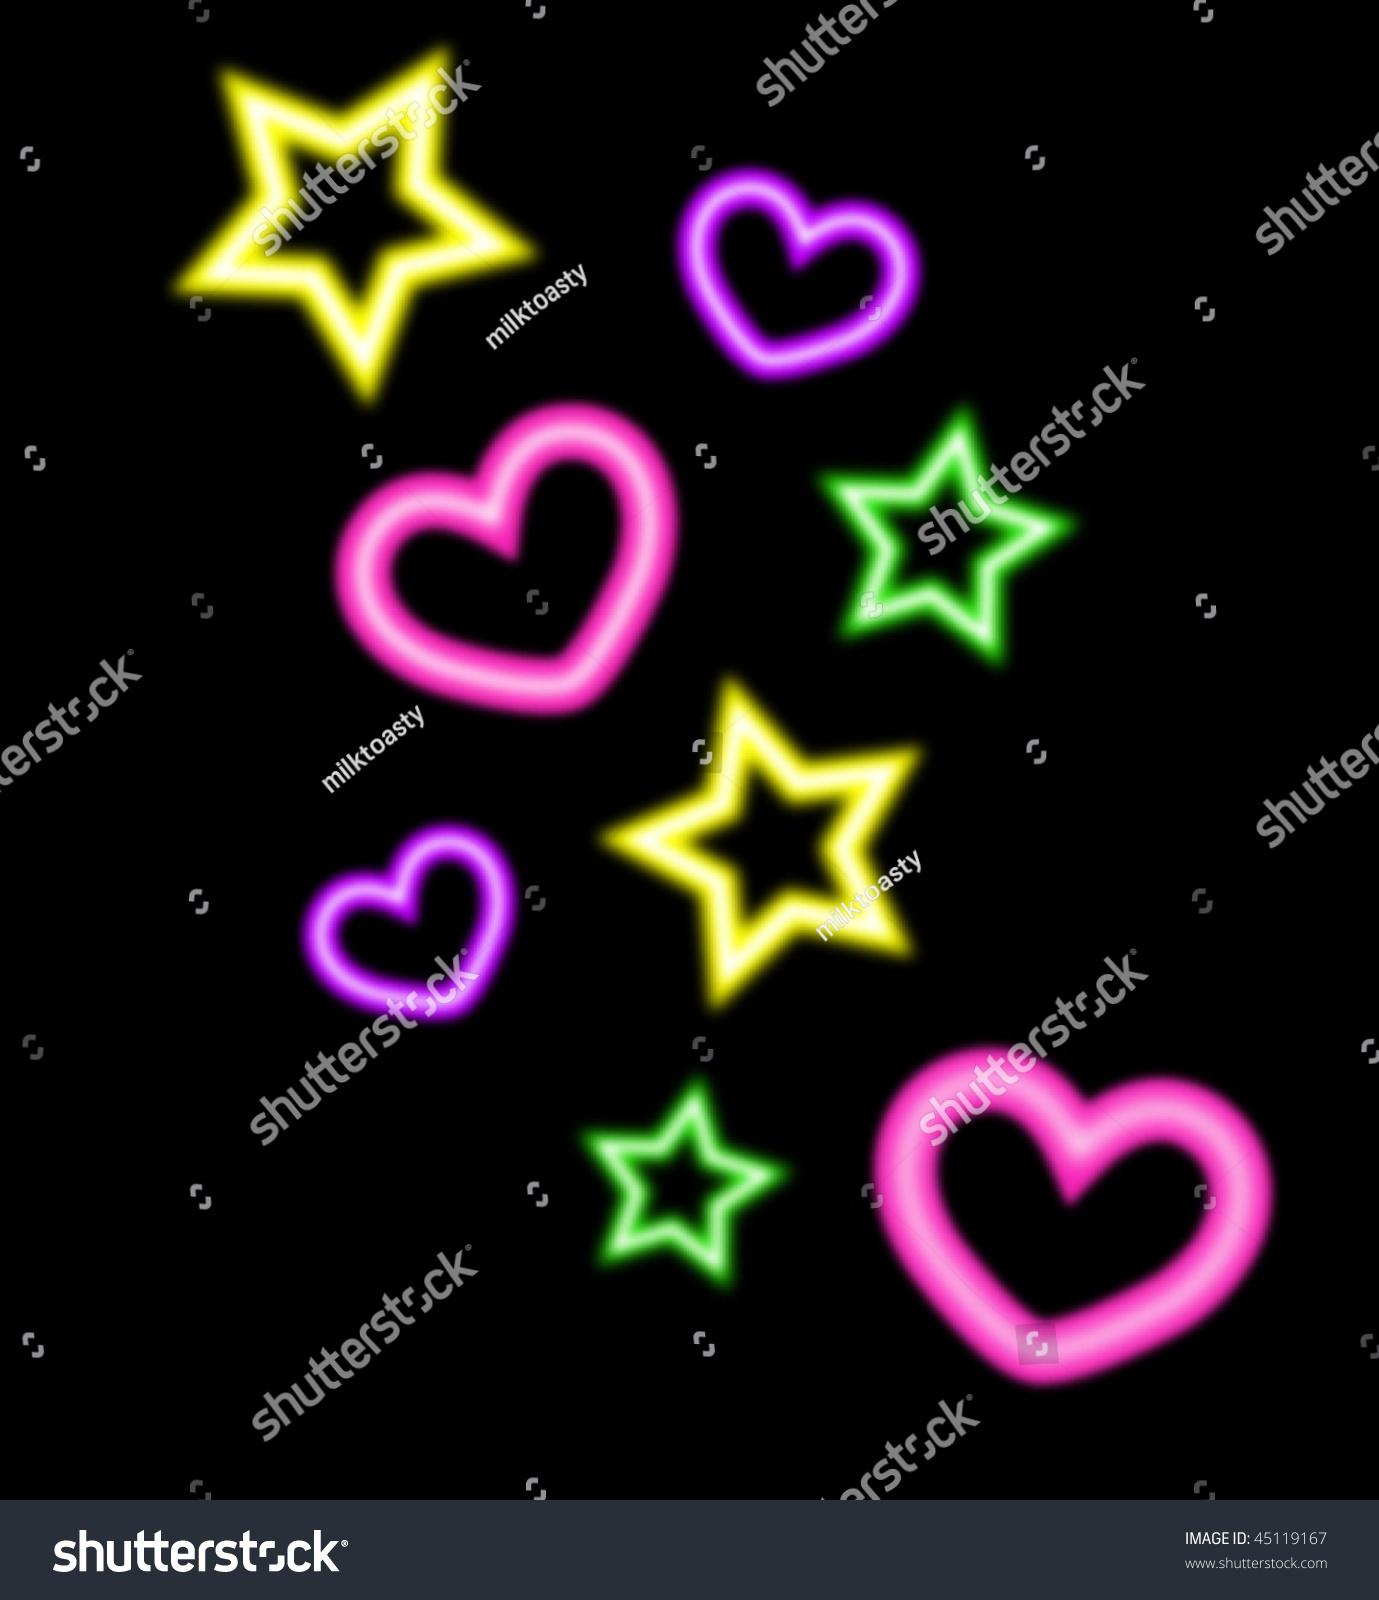 Neon Style Hearts Stars Vector Illustration Stock Vector Royalty Free 45119167